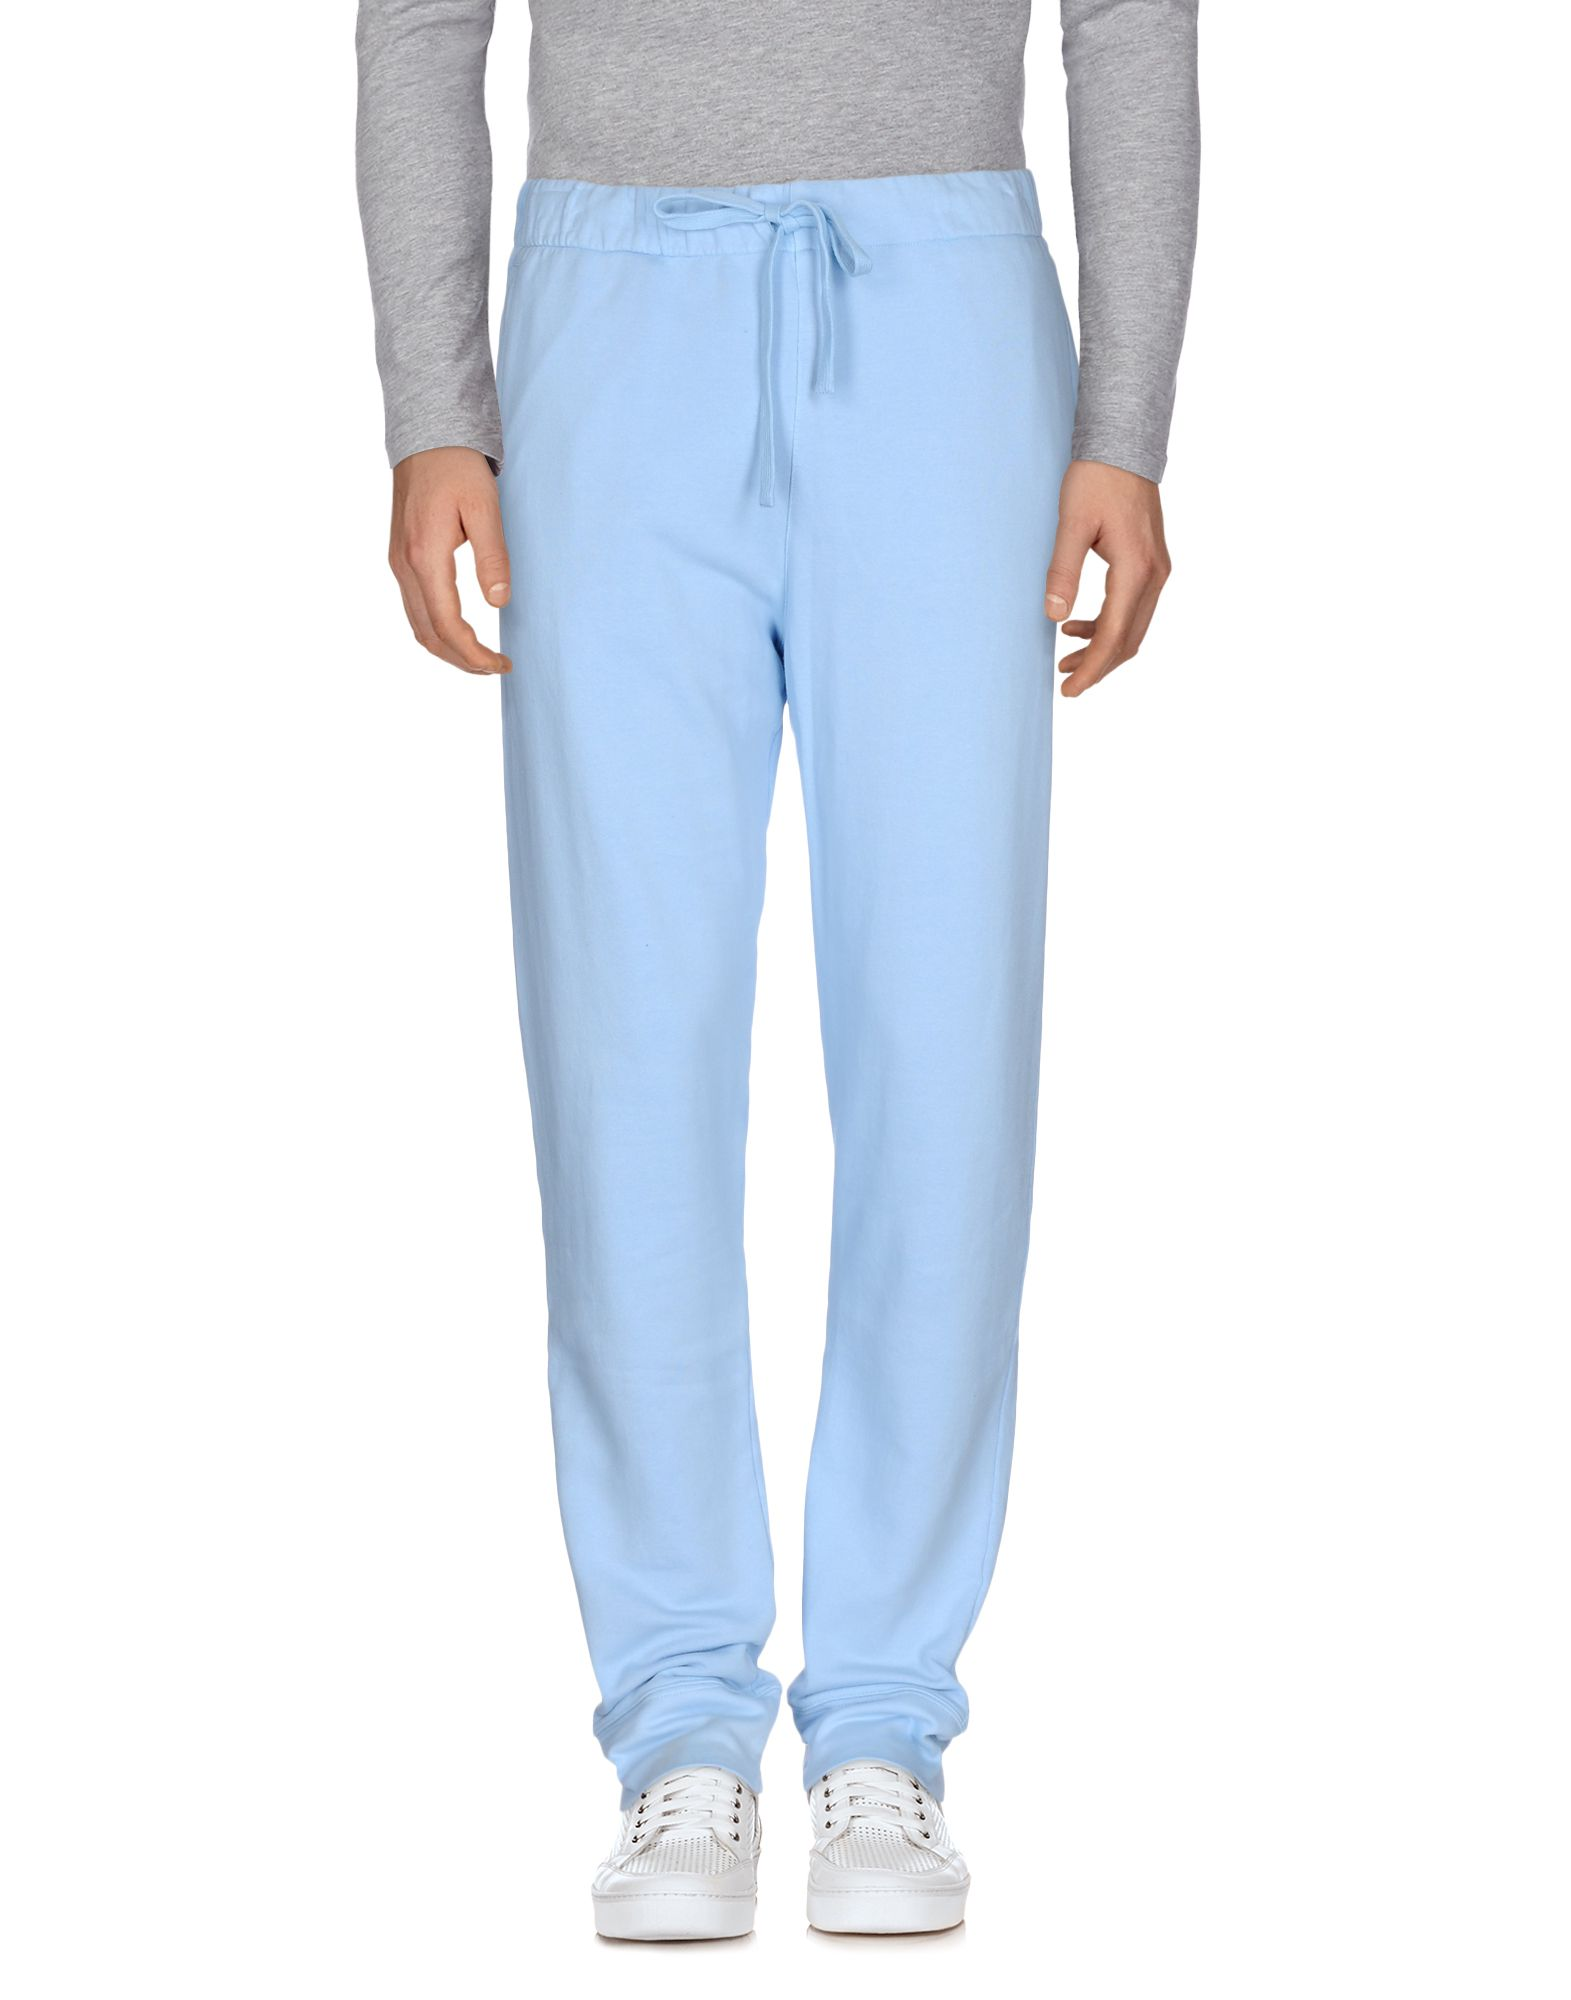 AIEZEN Casual Pants in Sky Blue